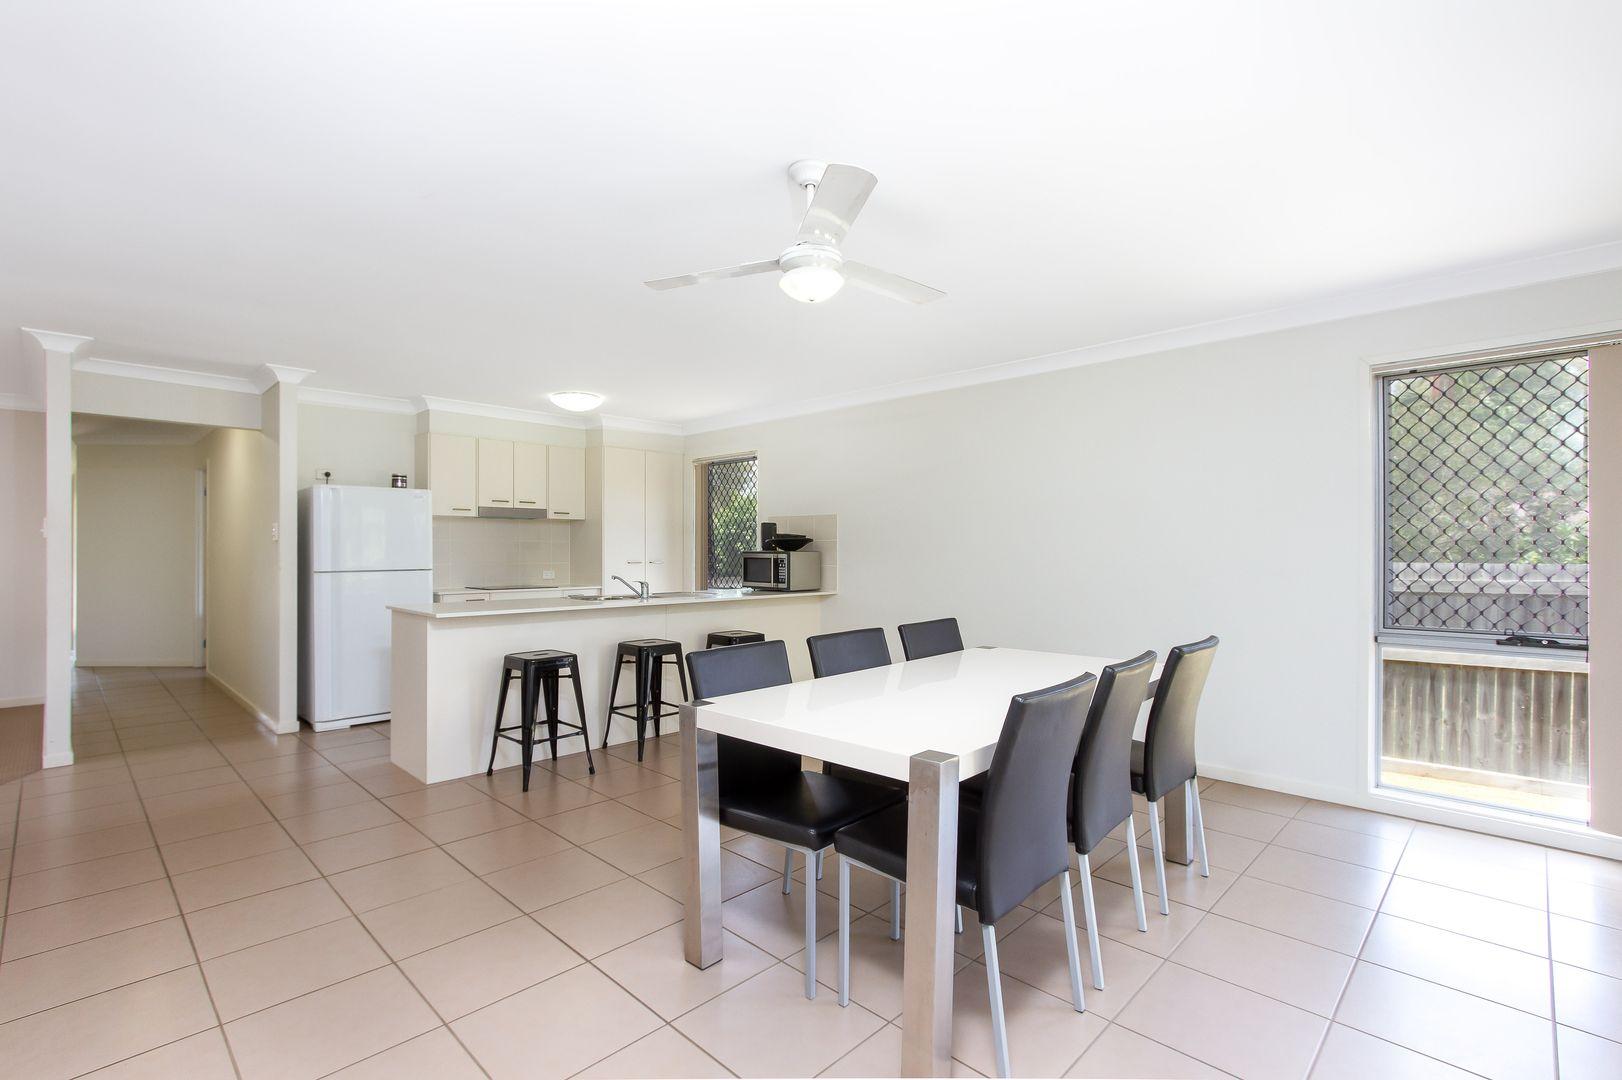 1/59 Richards St, Loganlea QLD 4131, Image 1